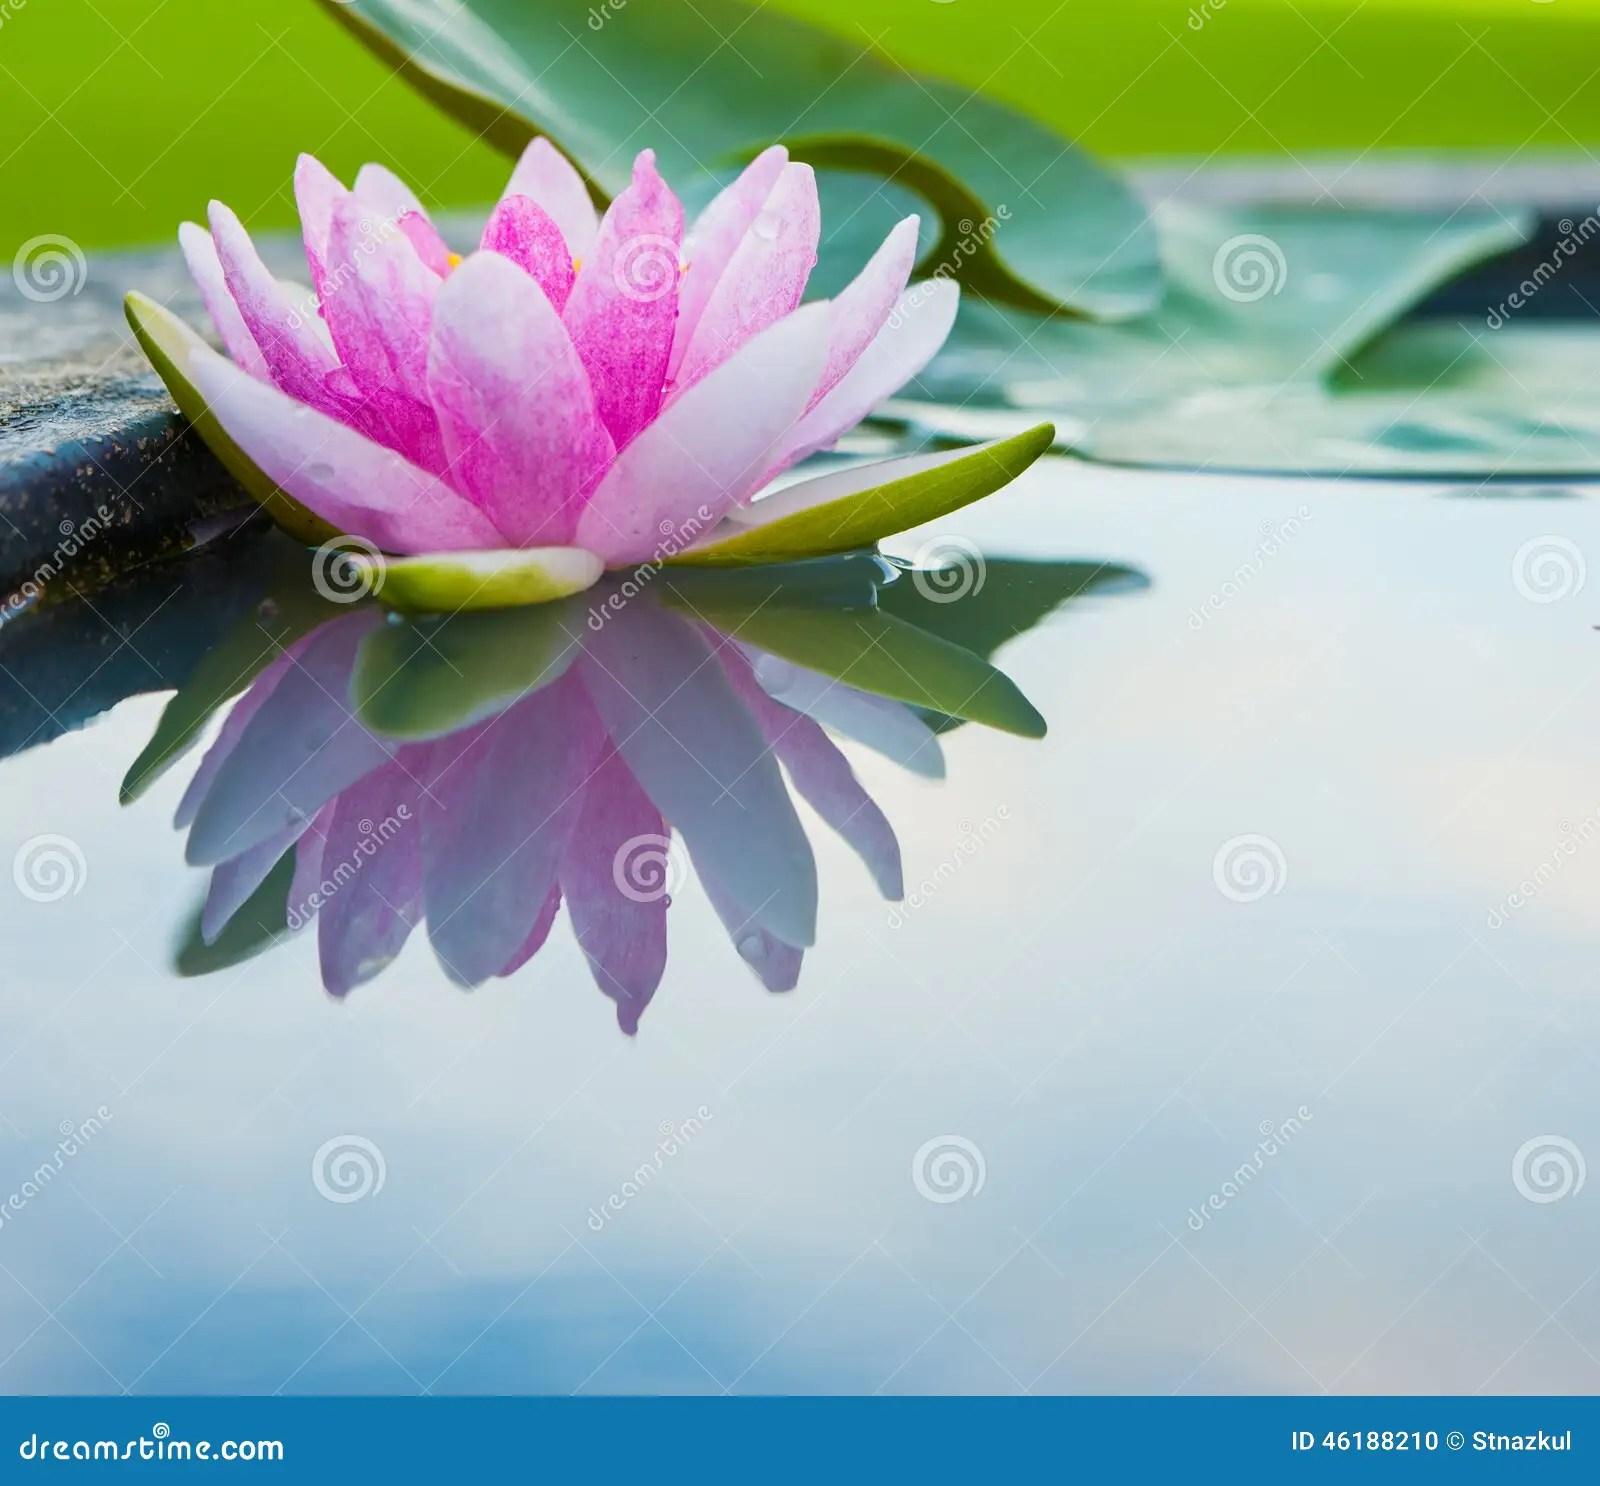 lotus in water plant diagram yamaha banshee drag wiring beautiful the pond stock photo cartoondealer